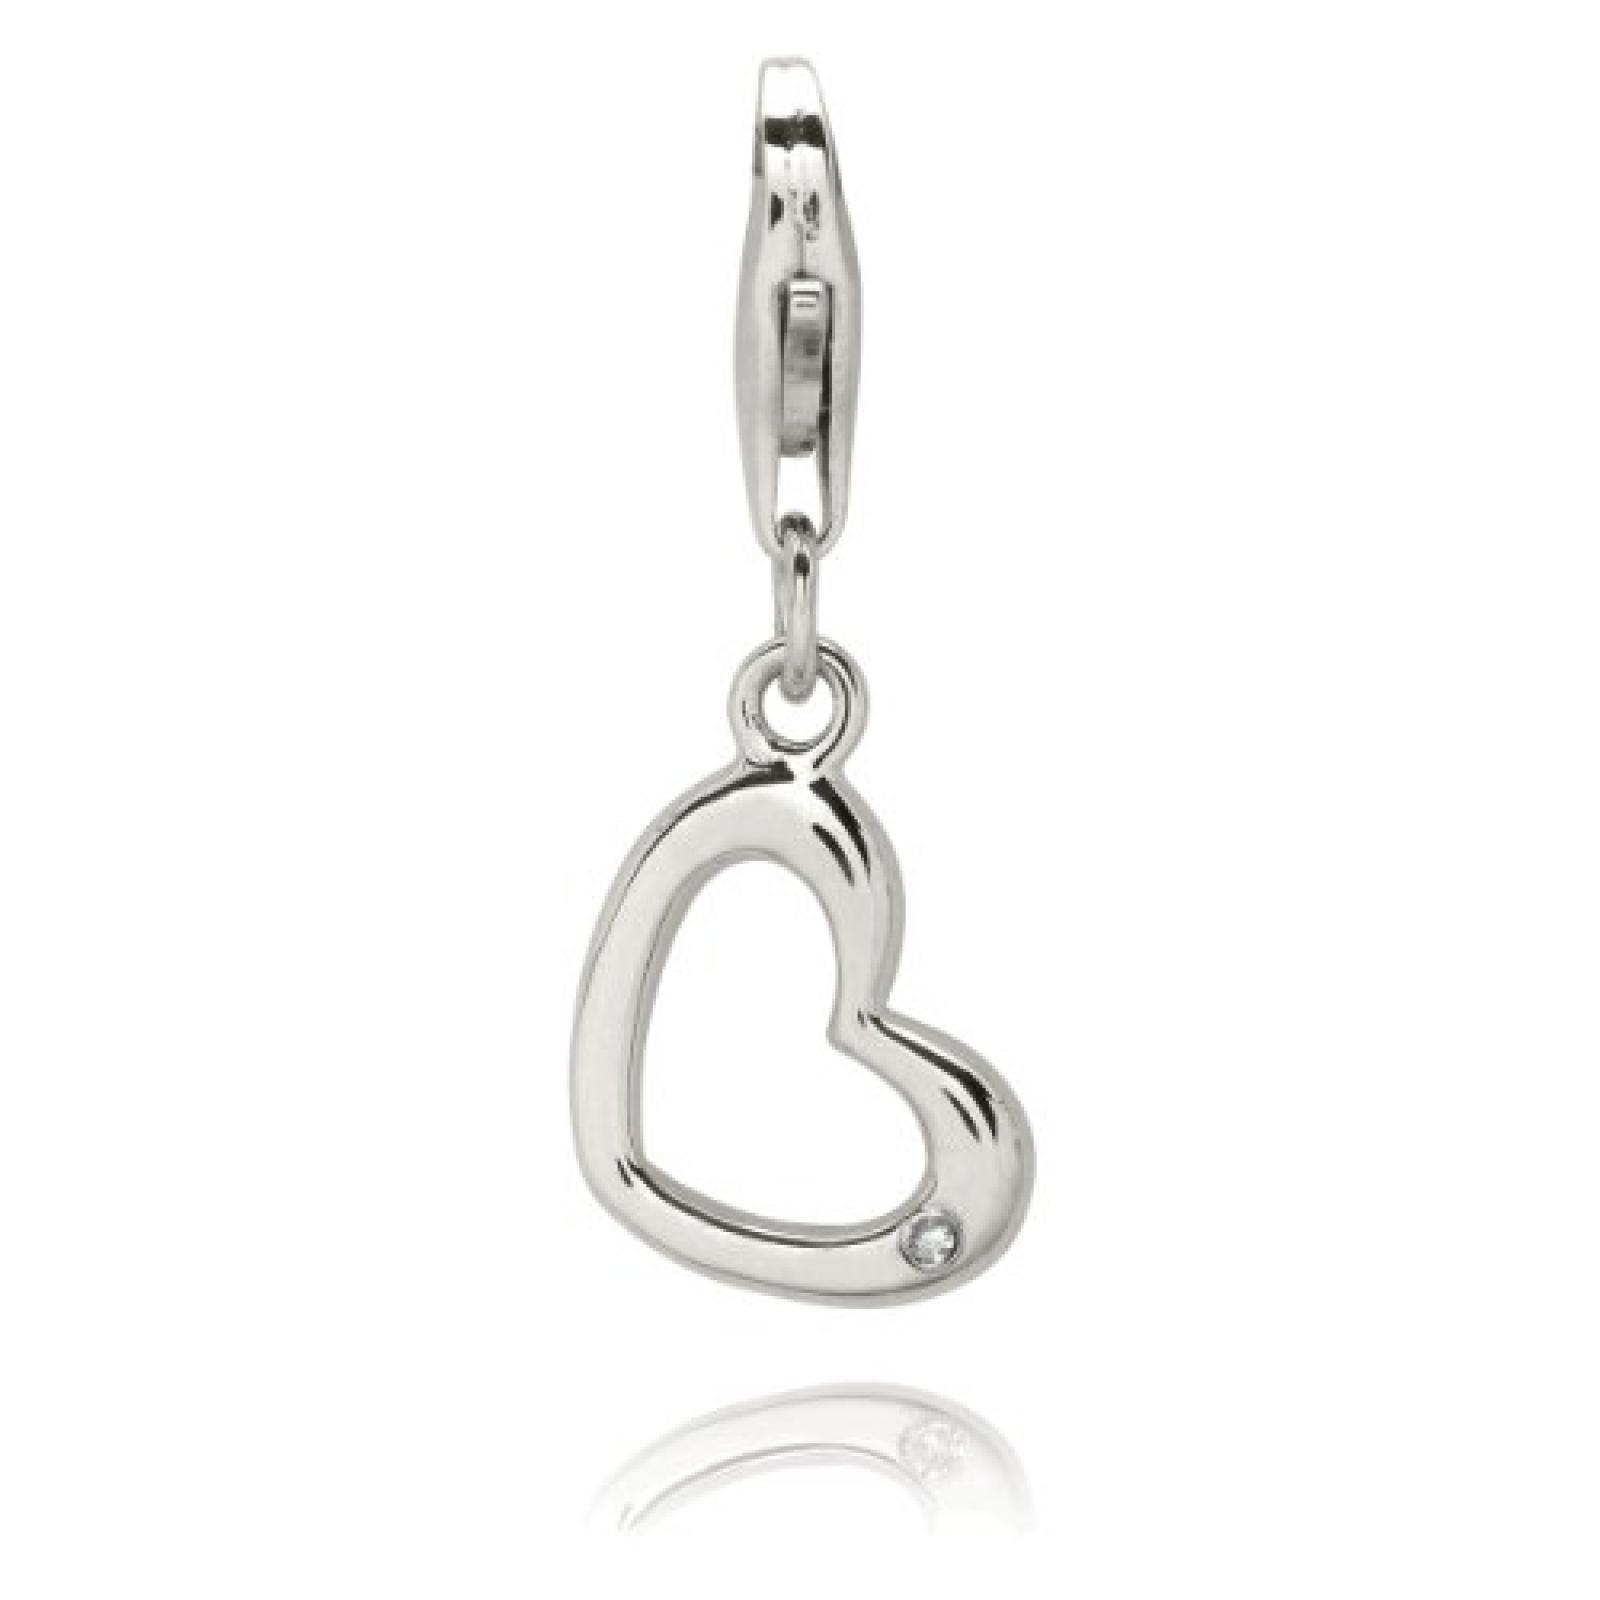 Rafaela Donata Damen-Charm Secret Diamonds Herz Sterling Silber weiß 60901022